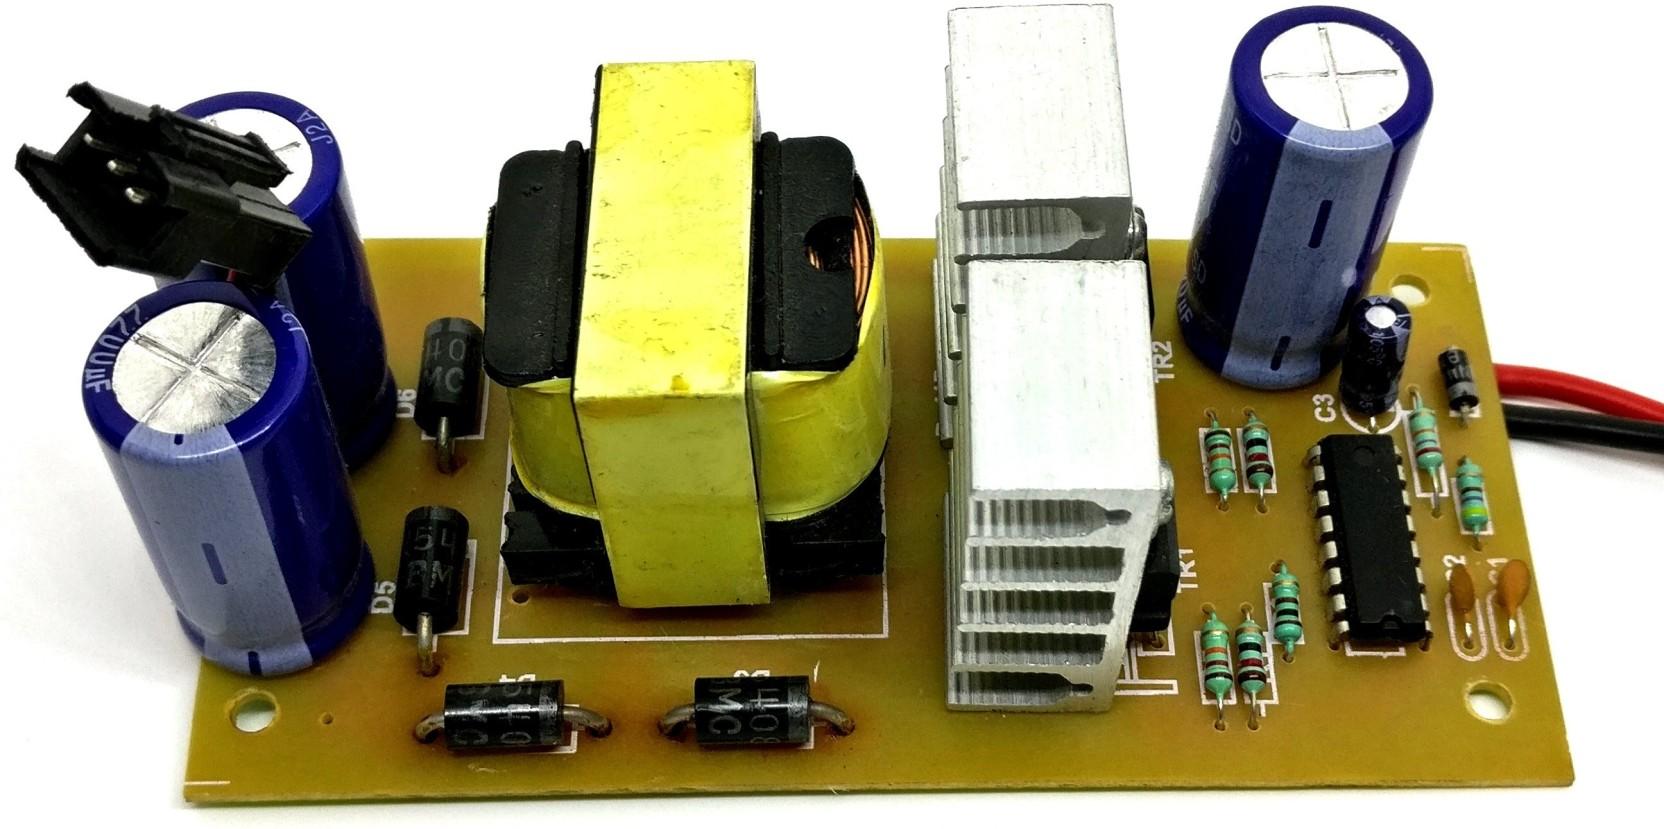 Tech And Trade Diy 12v Dc To 24 V 5 Amp Converter Power Supply Volt 45 Single Output 3055 Add Cart